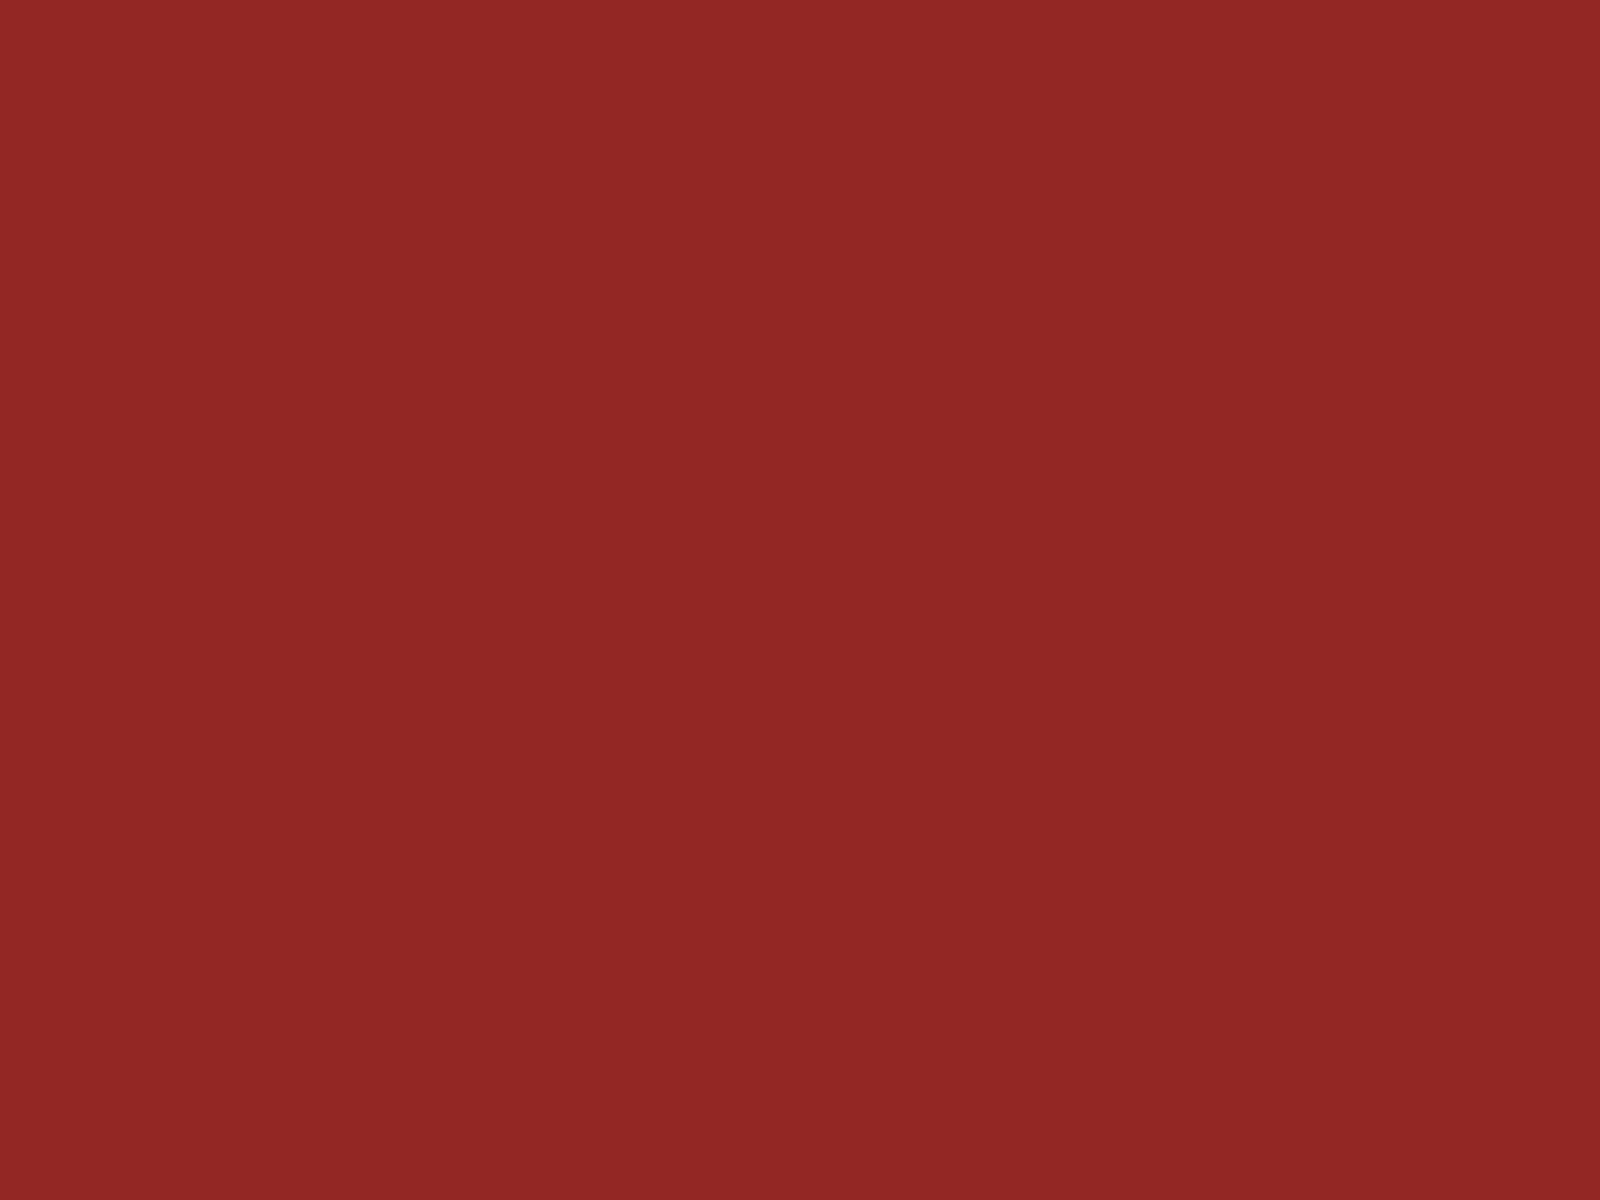 1600x1200 Vivid Auburn Solid Color Background